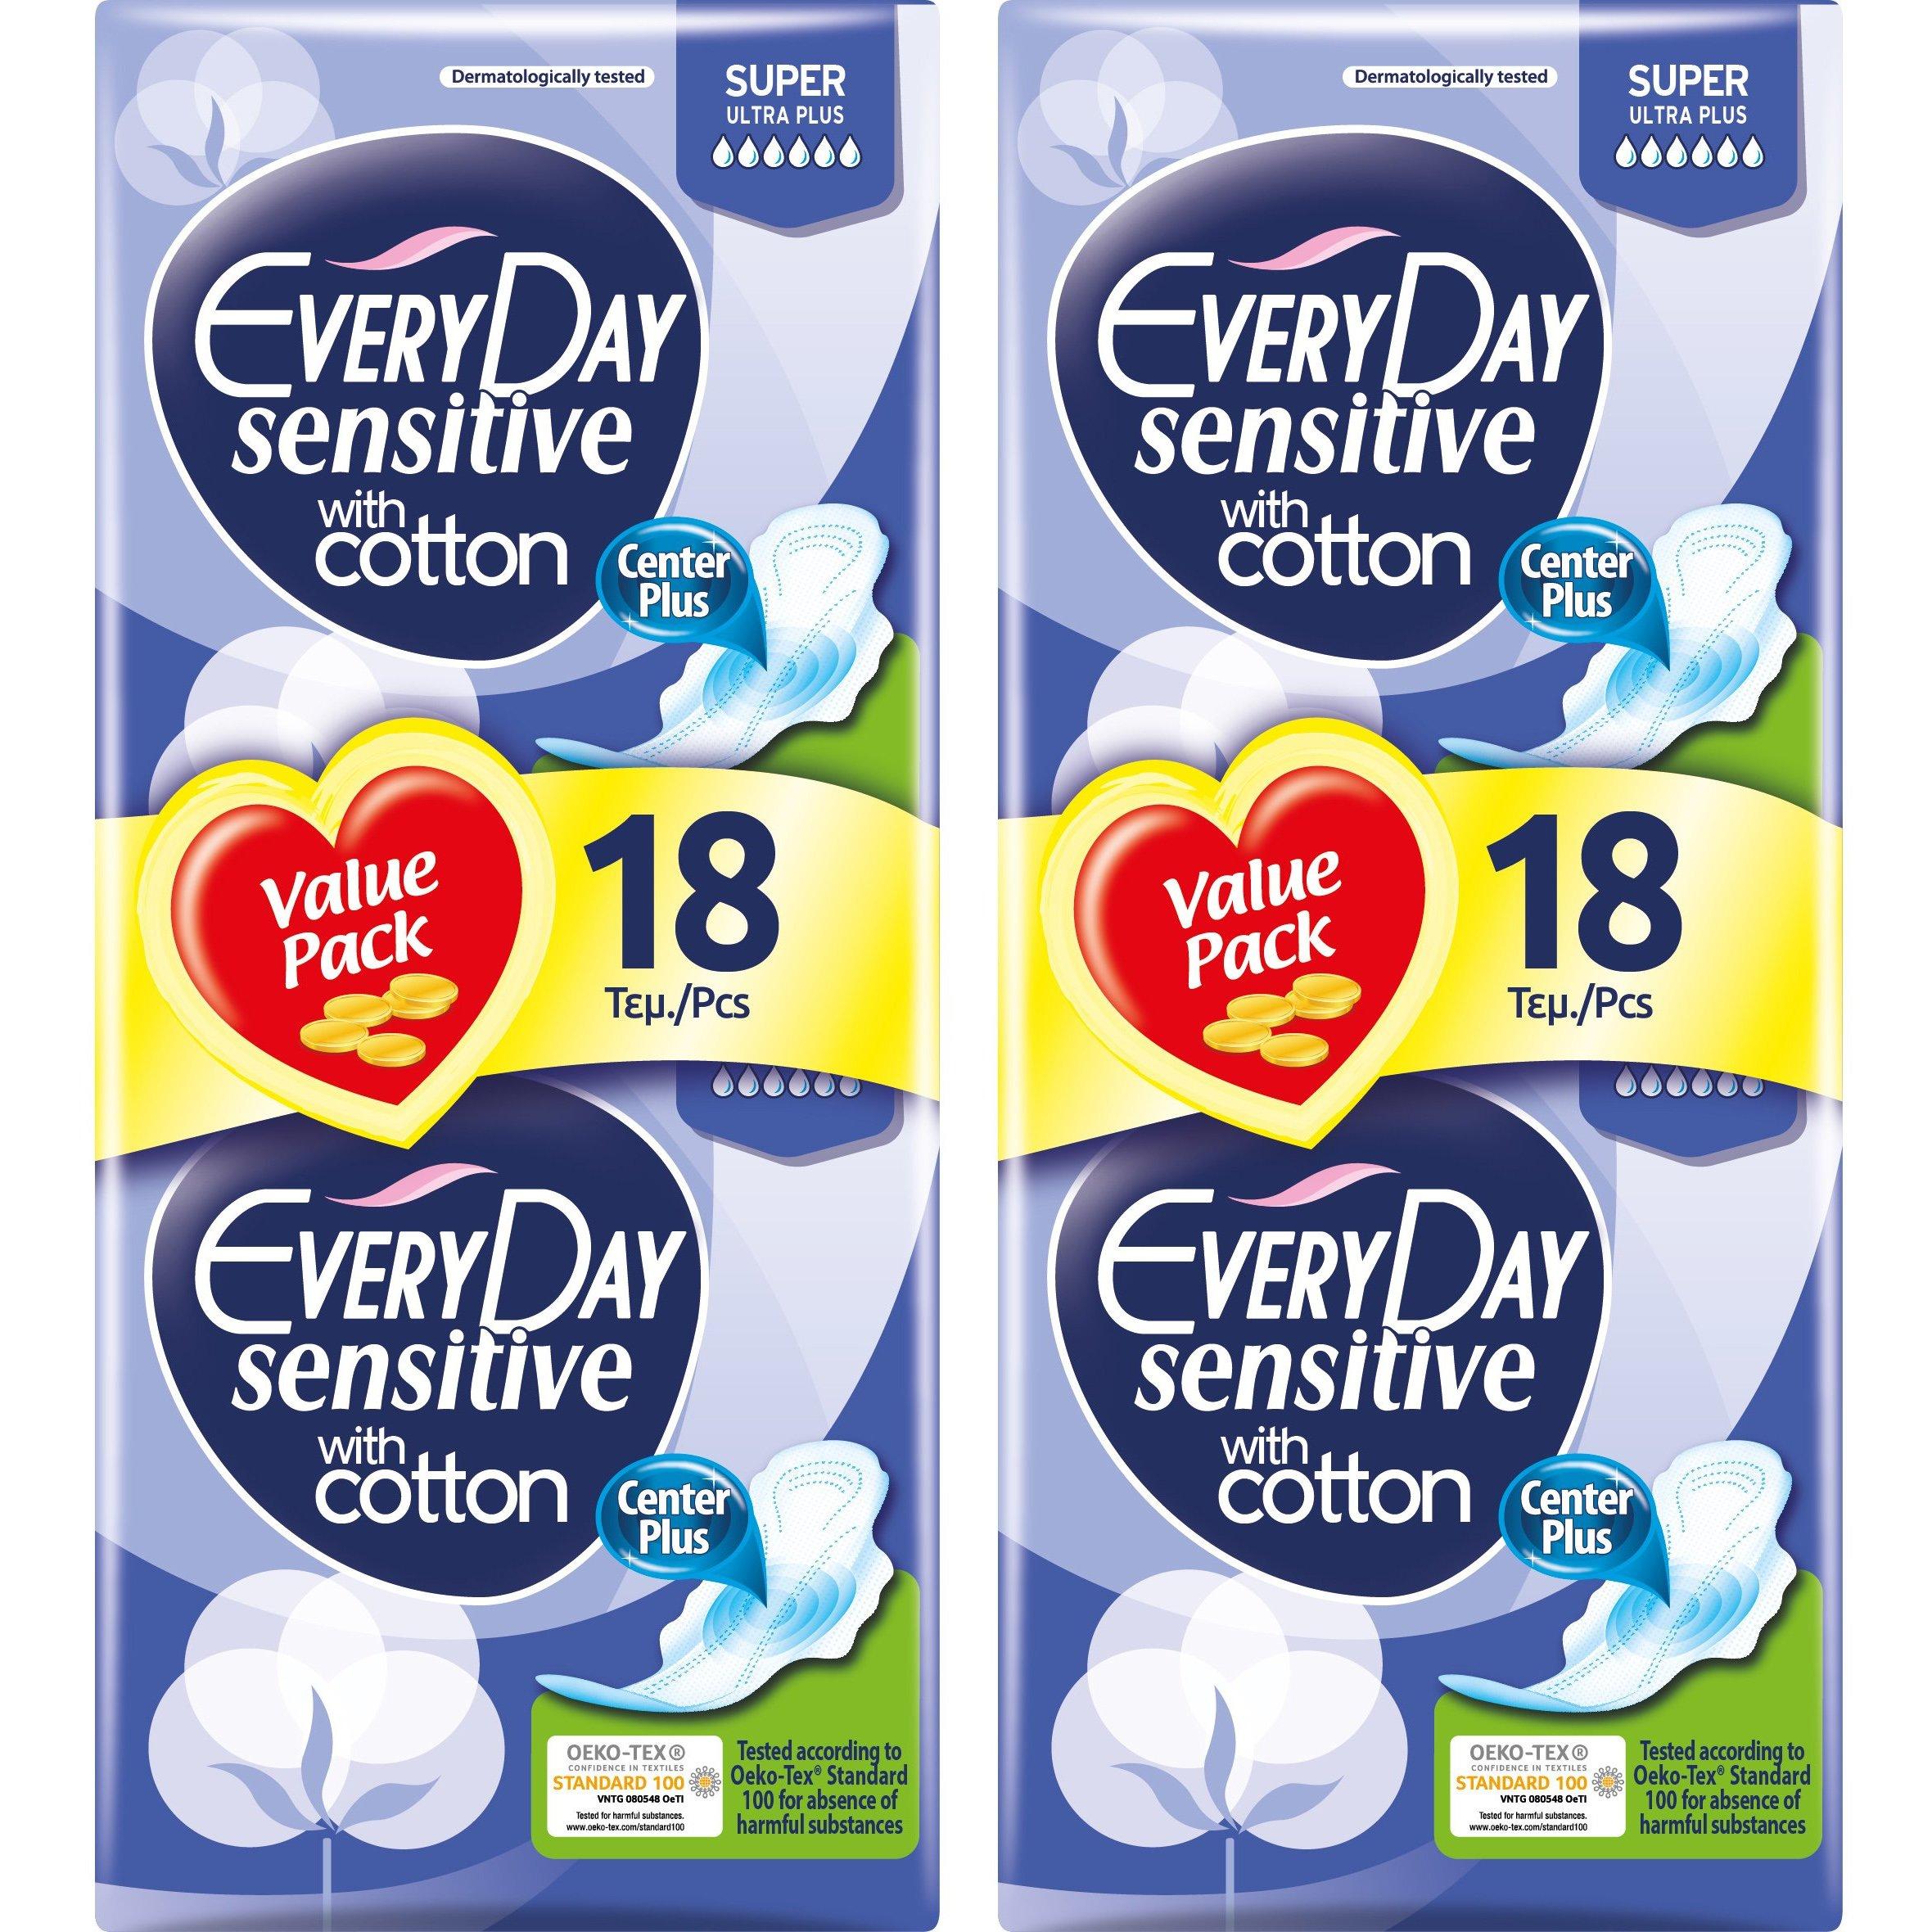 Every Day Πακέτο Προσφοράς Sensitive Super Ultra Plus Value Pack Σερβιέτες Ιδανικές για Πολύ Μεγάλη Ροή 2×18 Τεμάχια 1+1 Δώρο